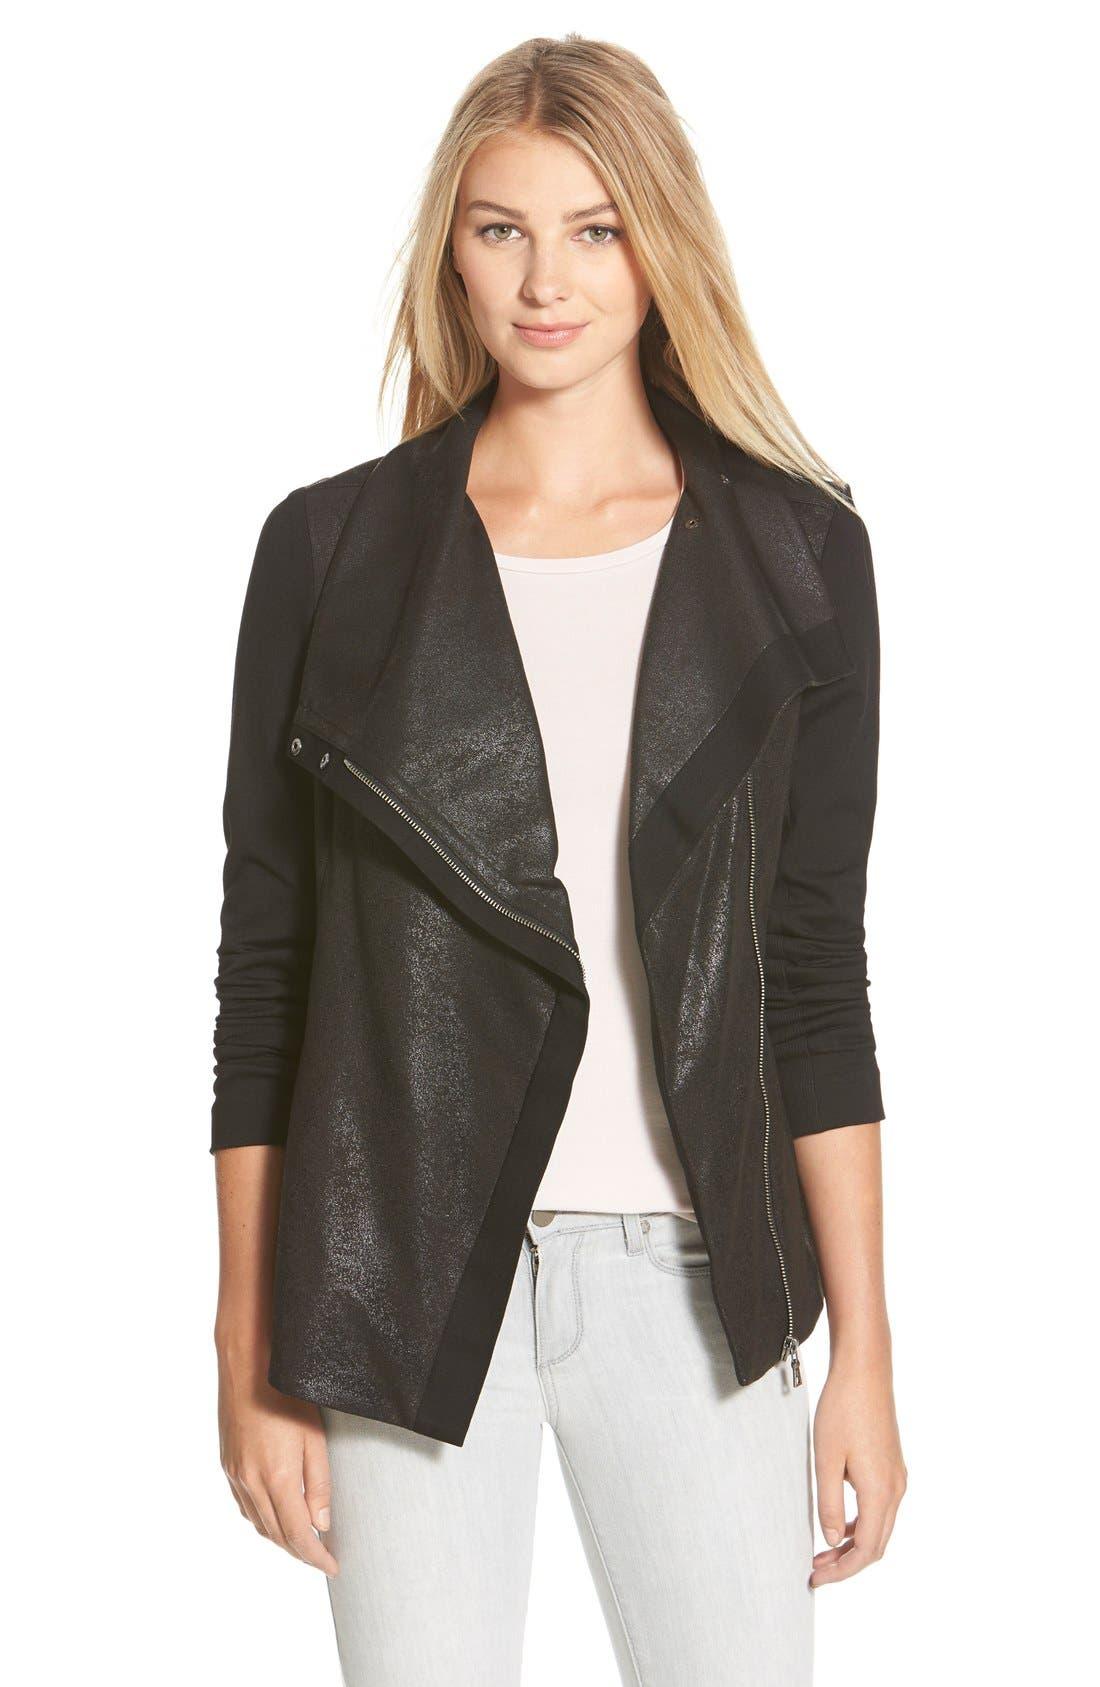 Distressed Foil Ponte Knit Asymmetrical Jacket,                             Main thumbnail 1, color,                             Rich Black